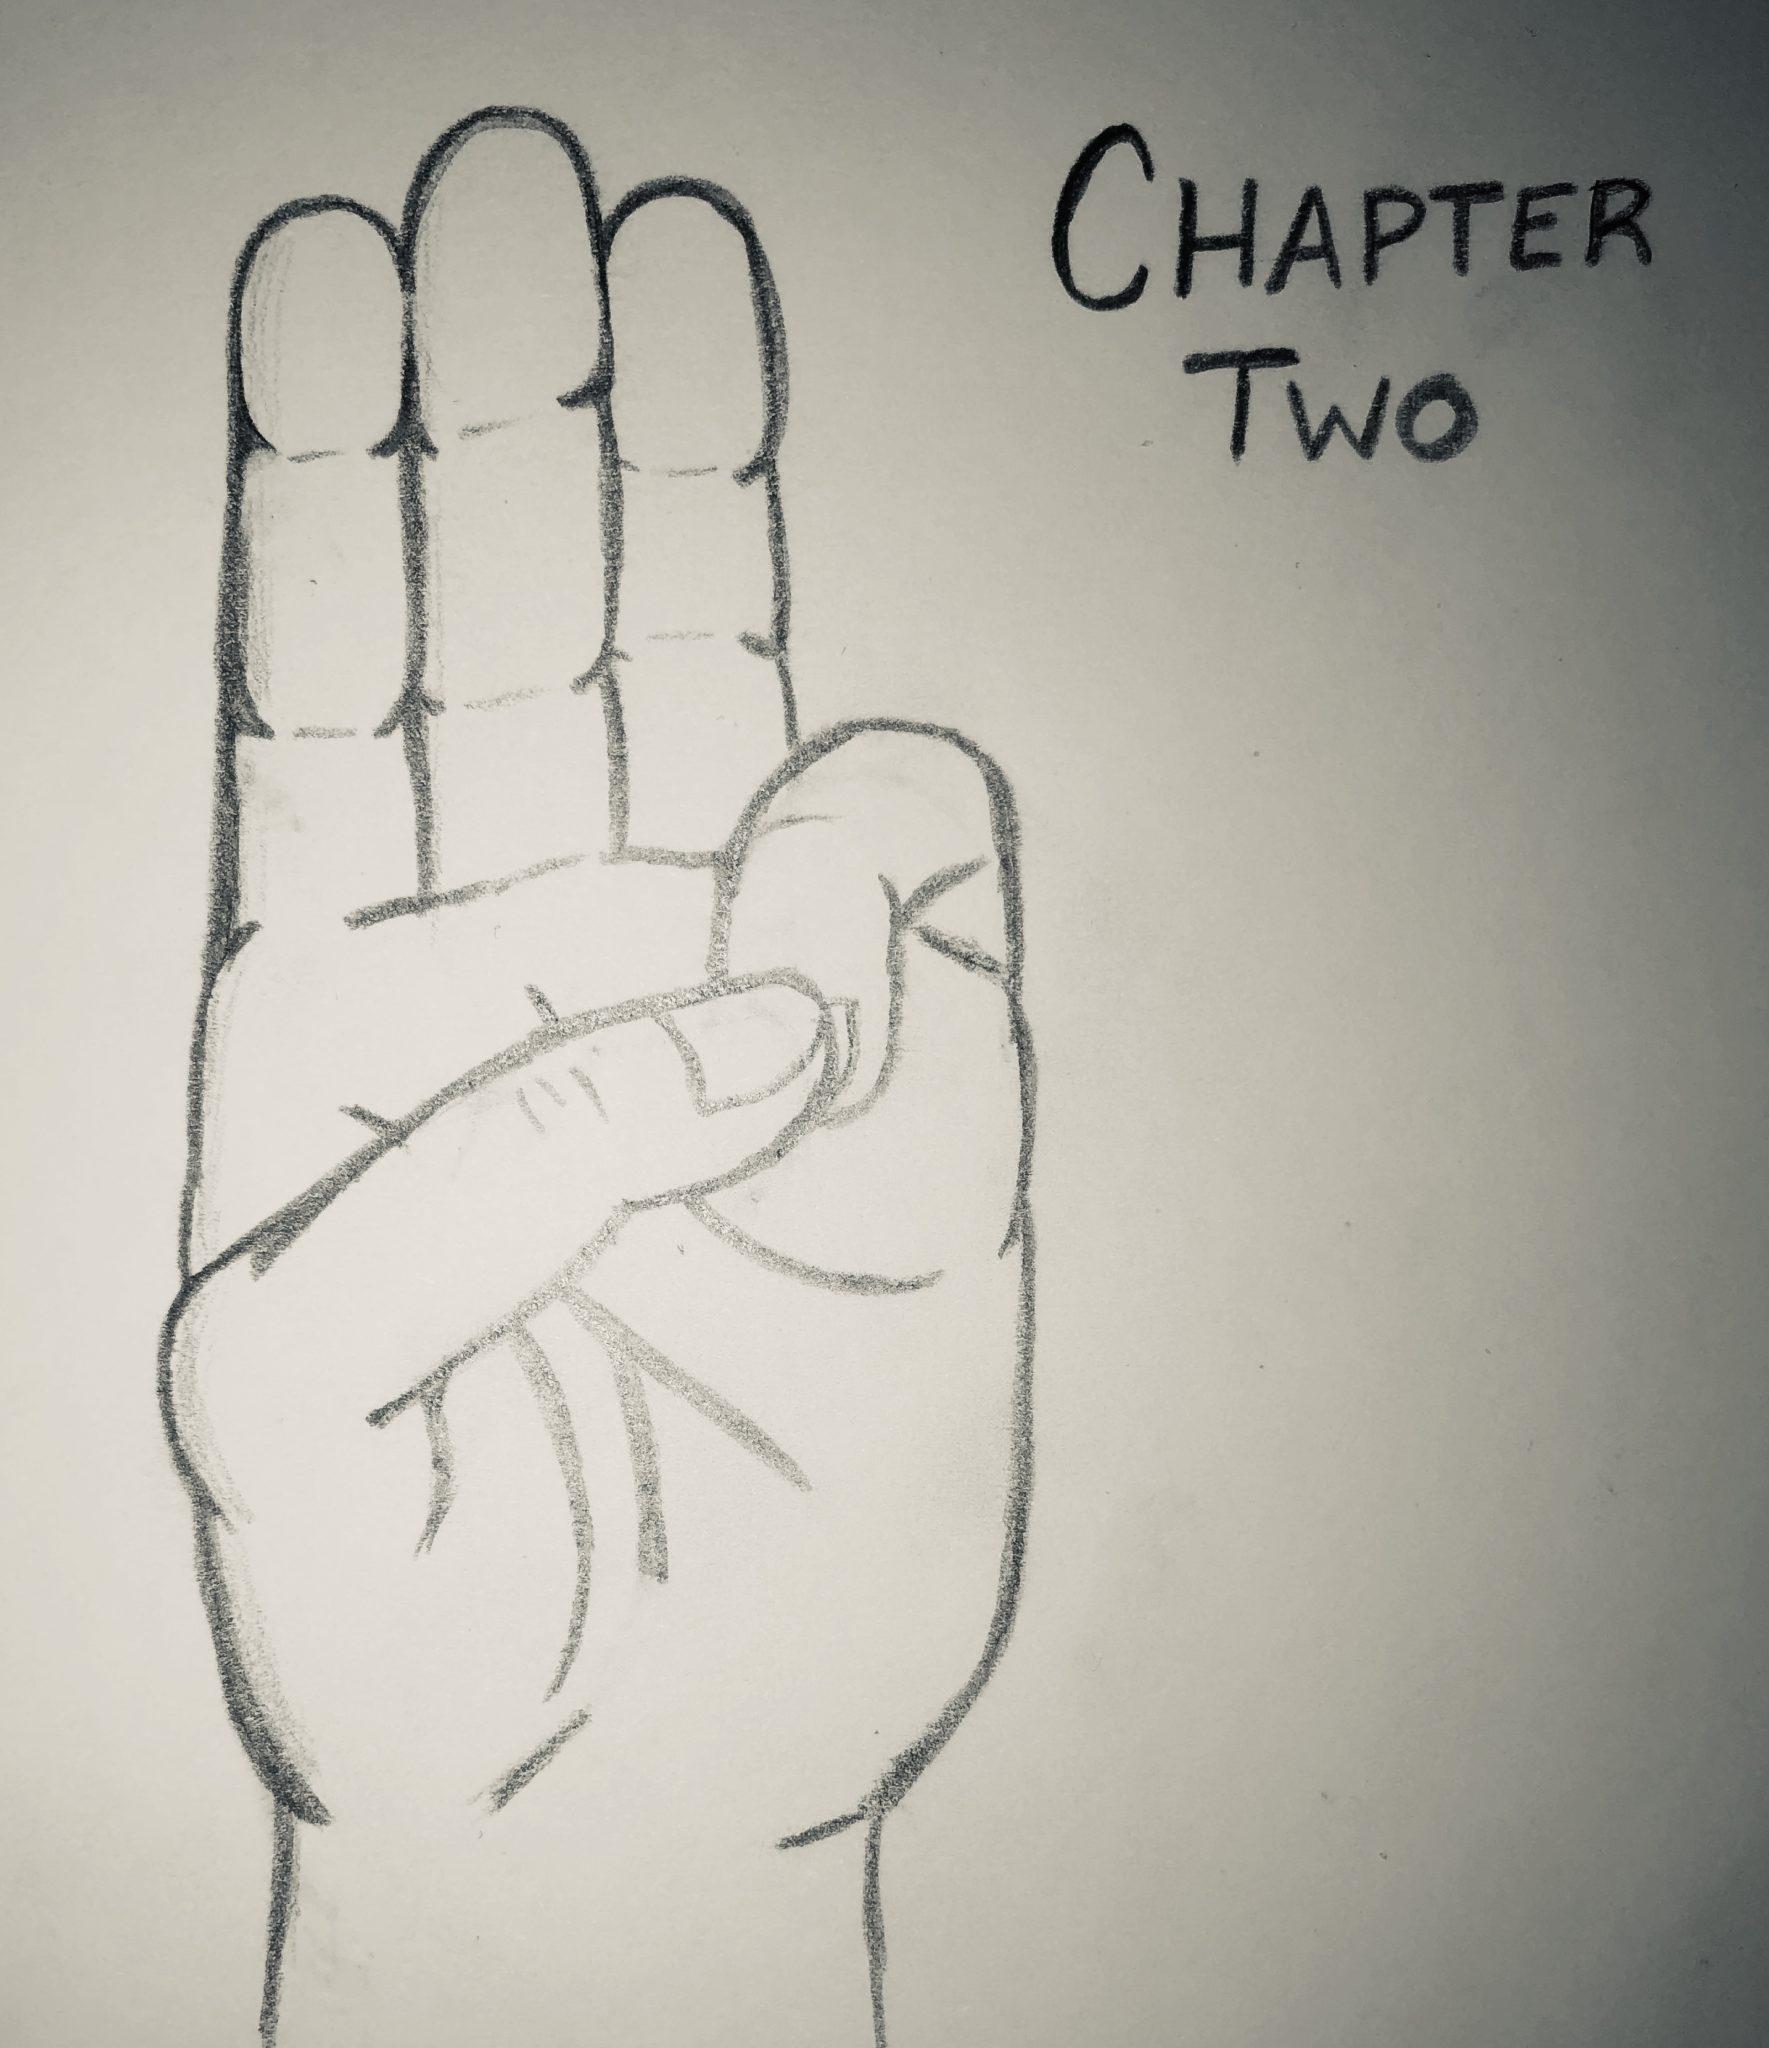 The Hunger Games Peeta S Pov Chapter 2